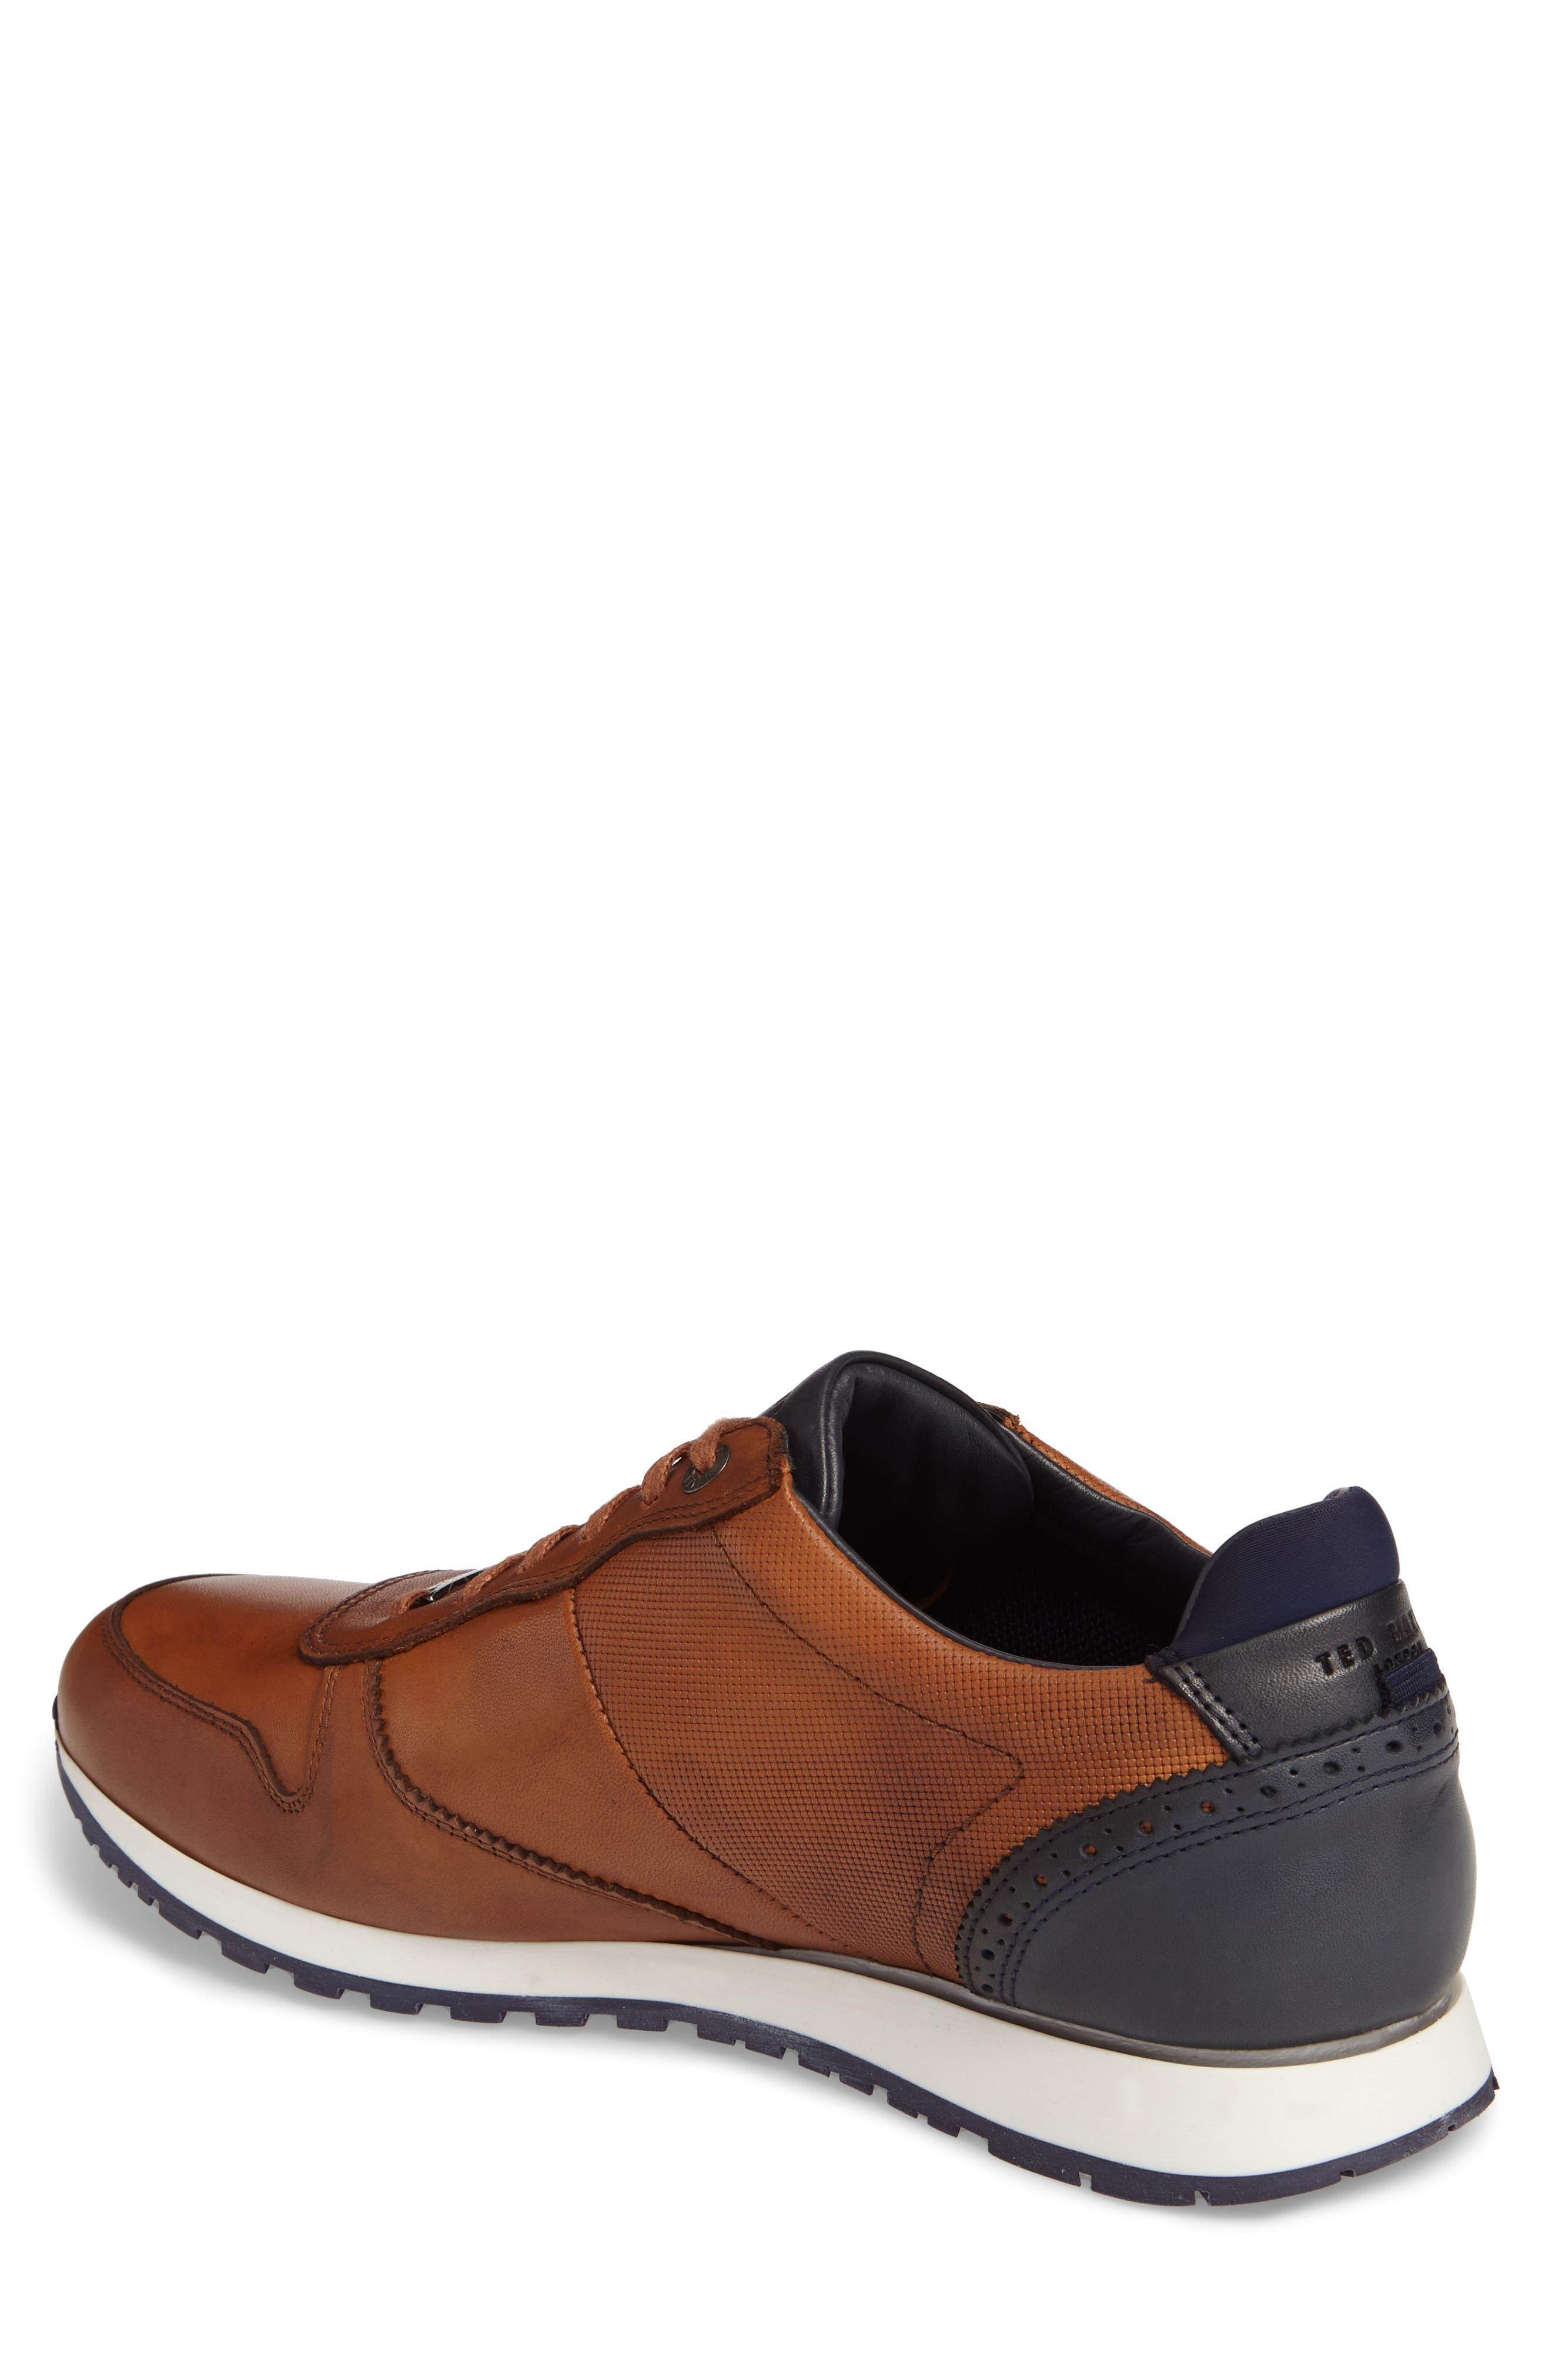 Shindl Sneaker,                             Alternate thumbnail 15, color,